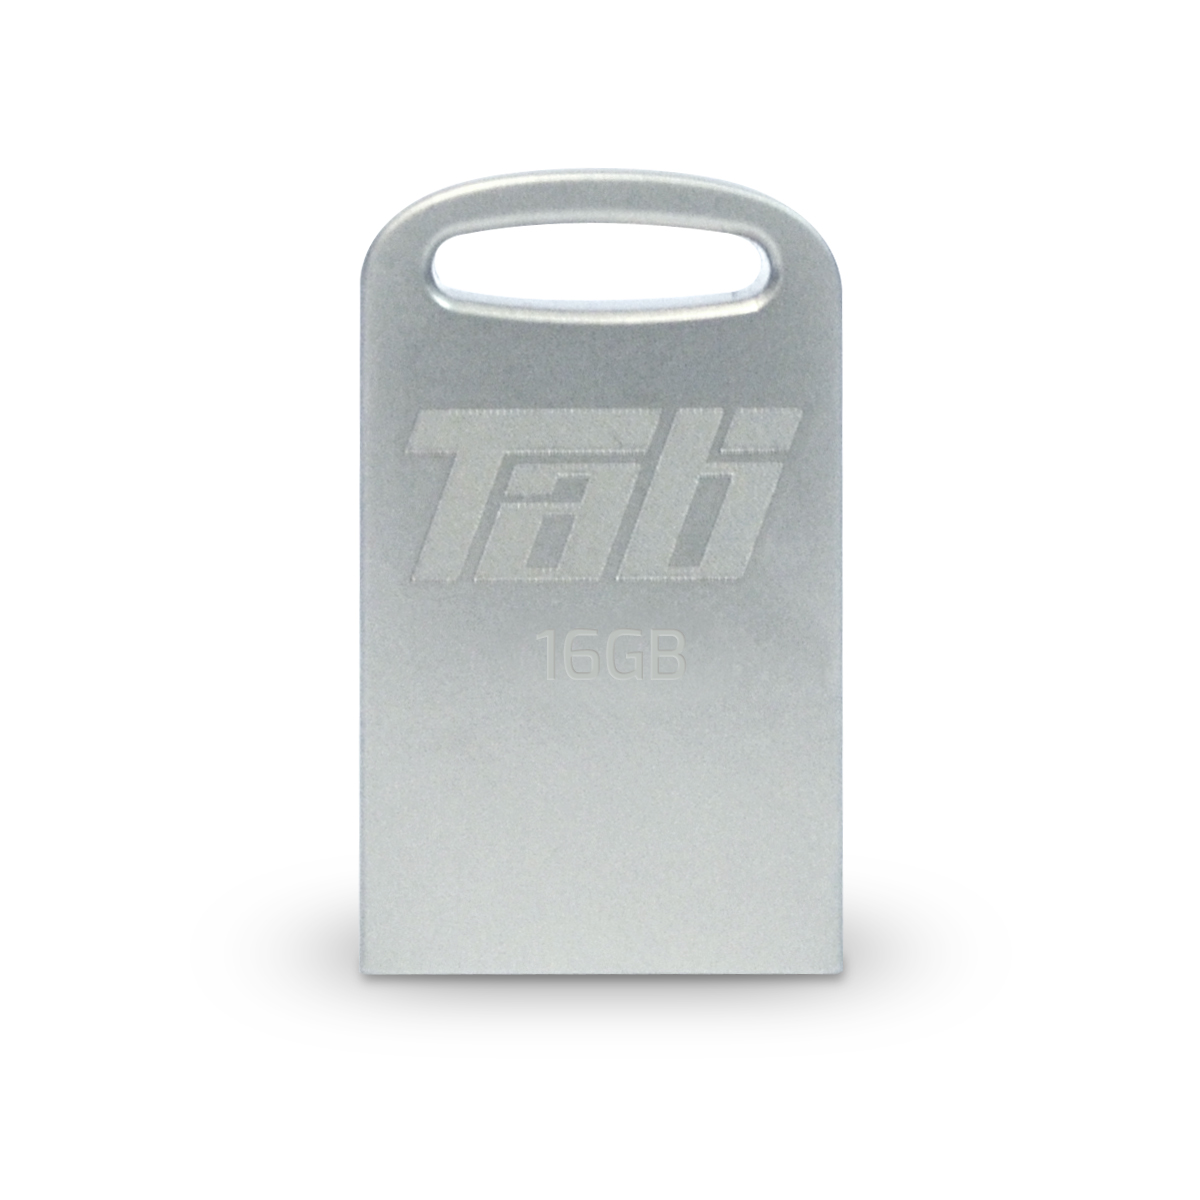 16GB Patriot Tab USB 3.0 (až 80MB/s přenos)